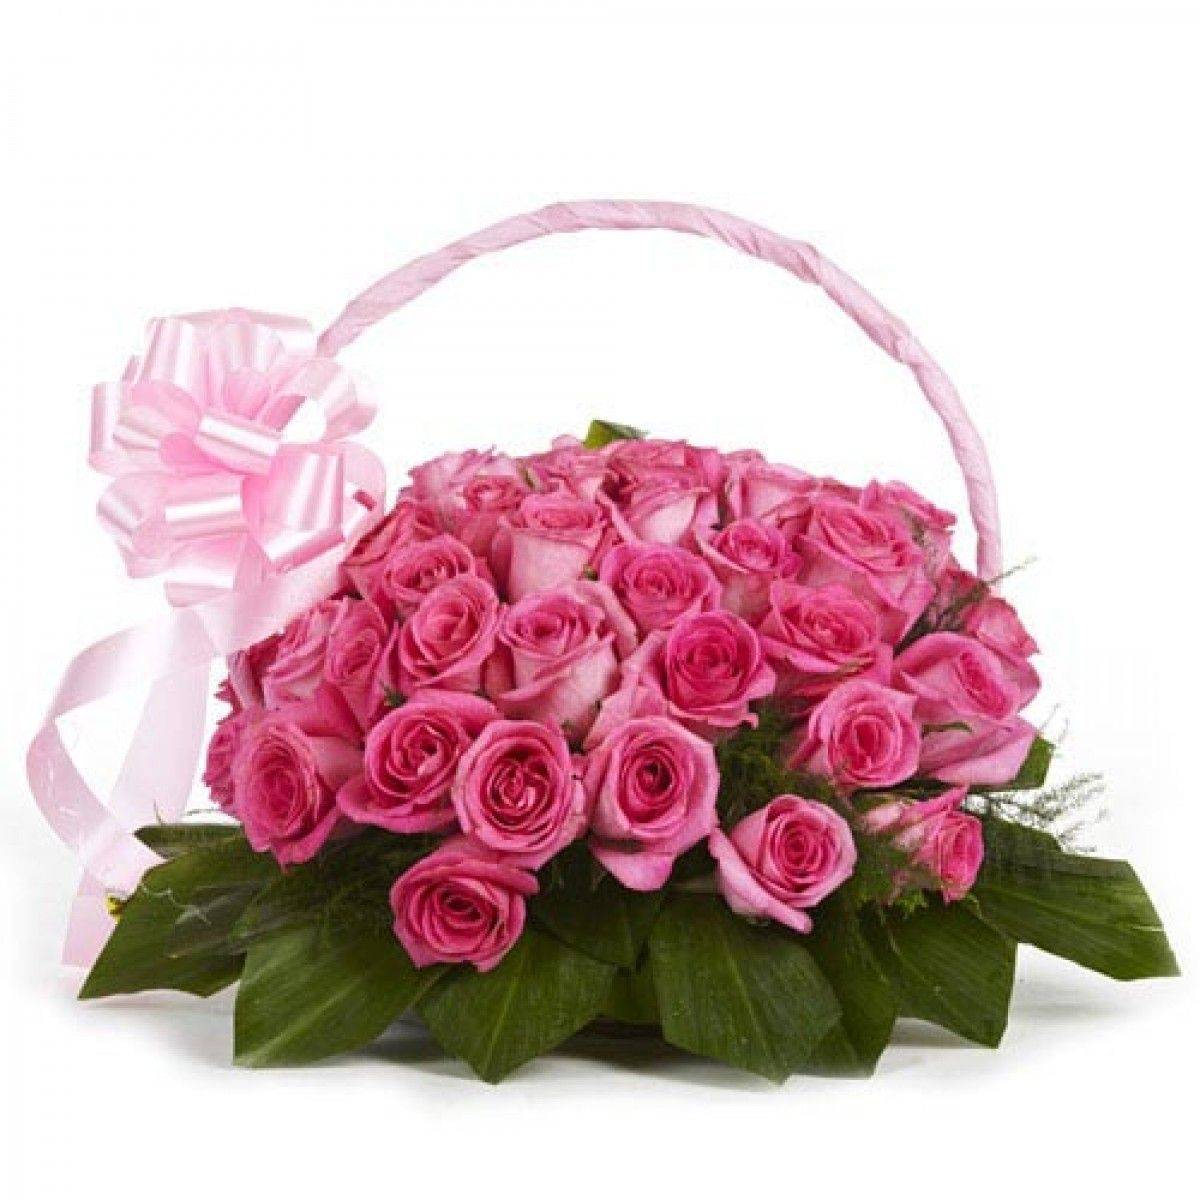 Flowers Bouquet Online Stock Flower Images Pinterest Stock